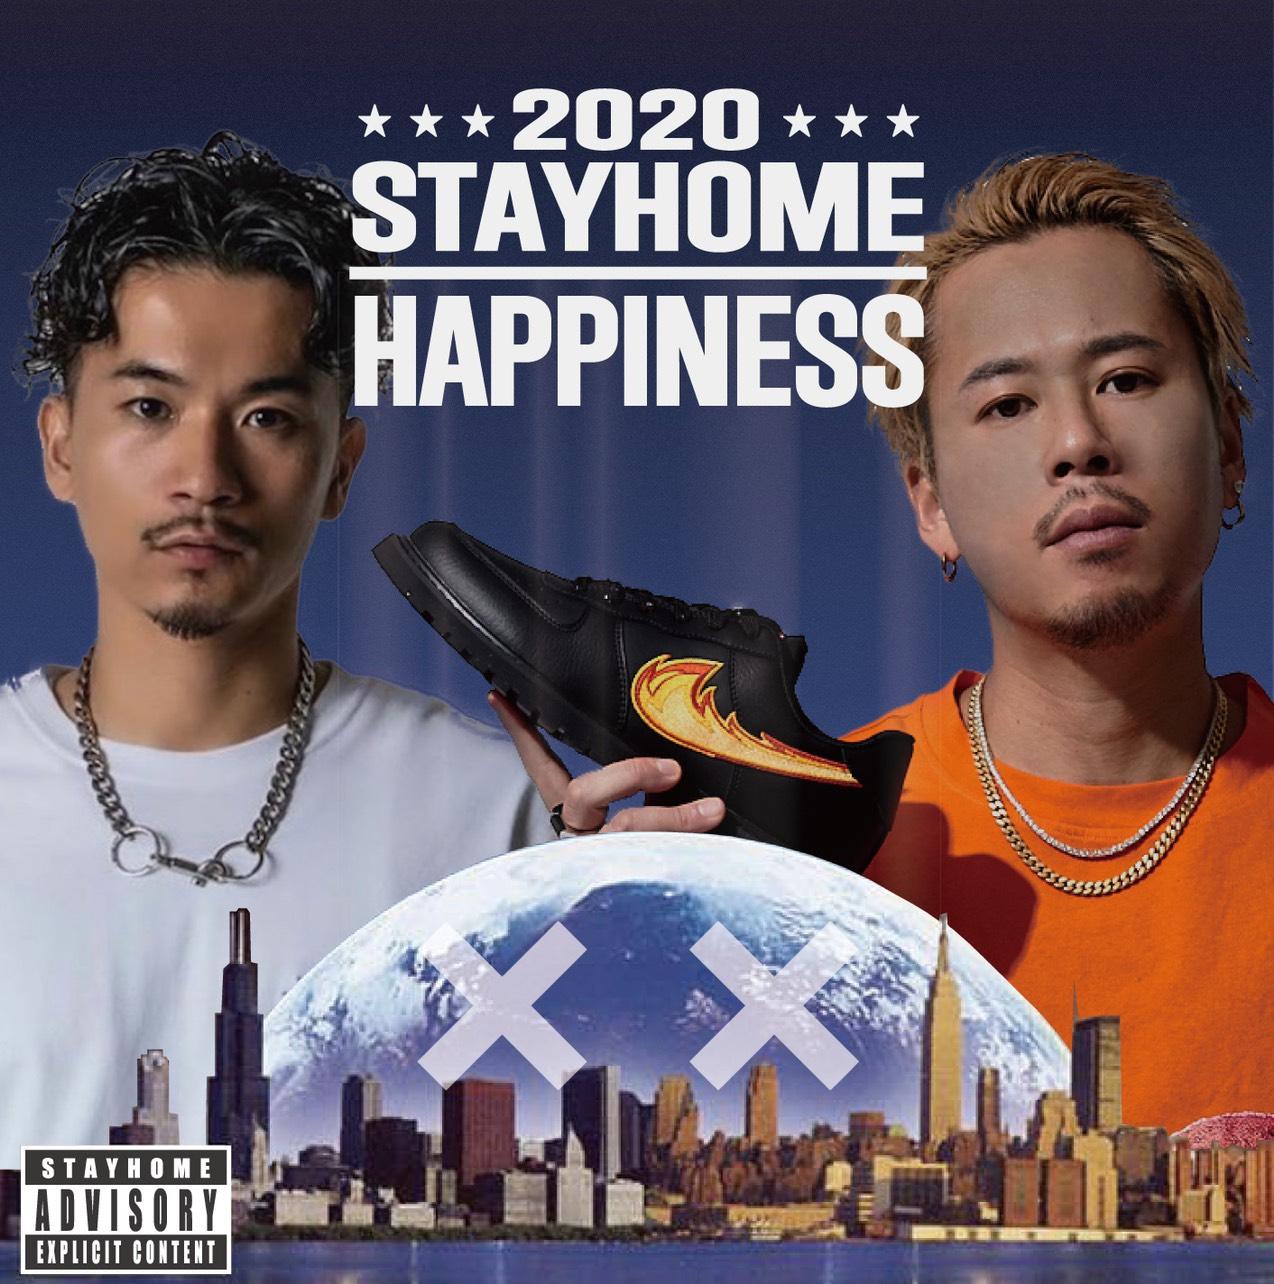 DJ HALとDJ KEKKEのコラボミックス『STAY HOME MIX』が無料公開サムネイル画像